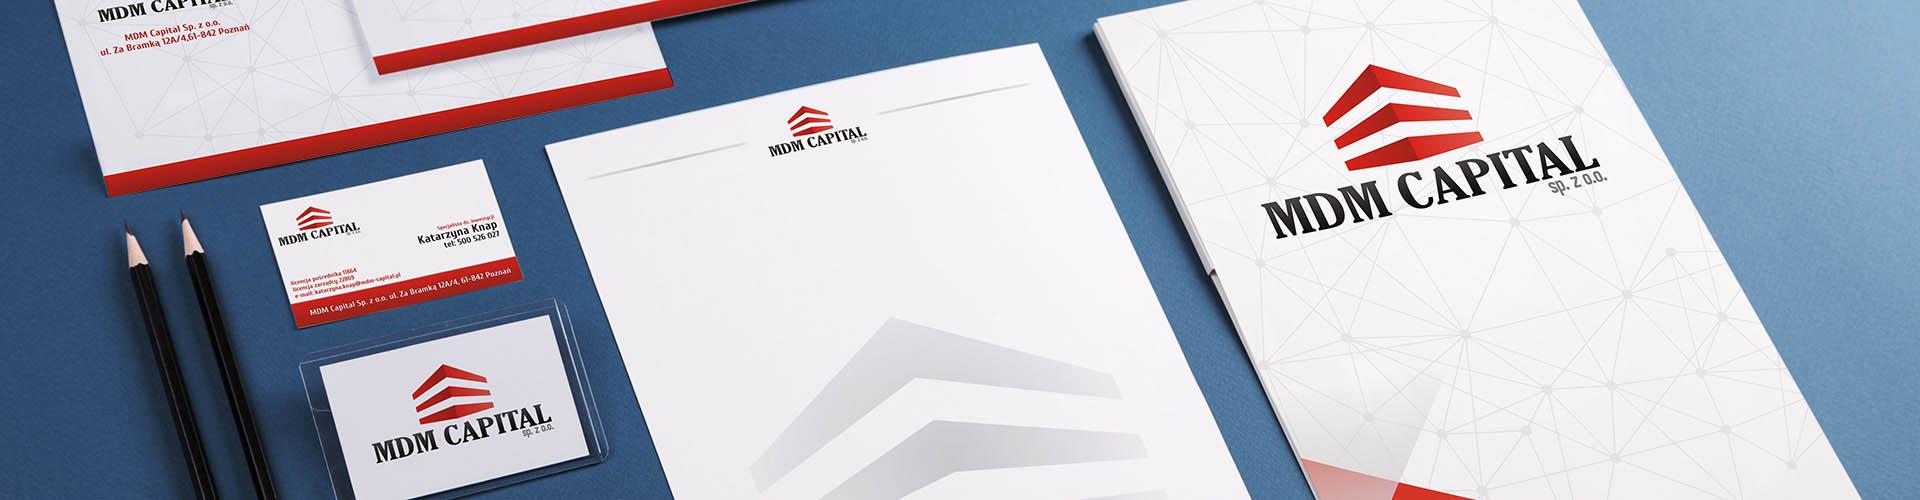 papier firmowy revenart